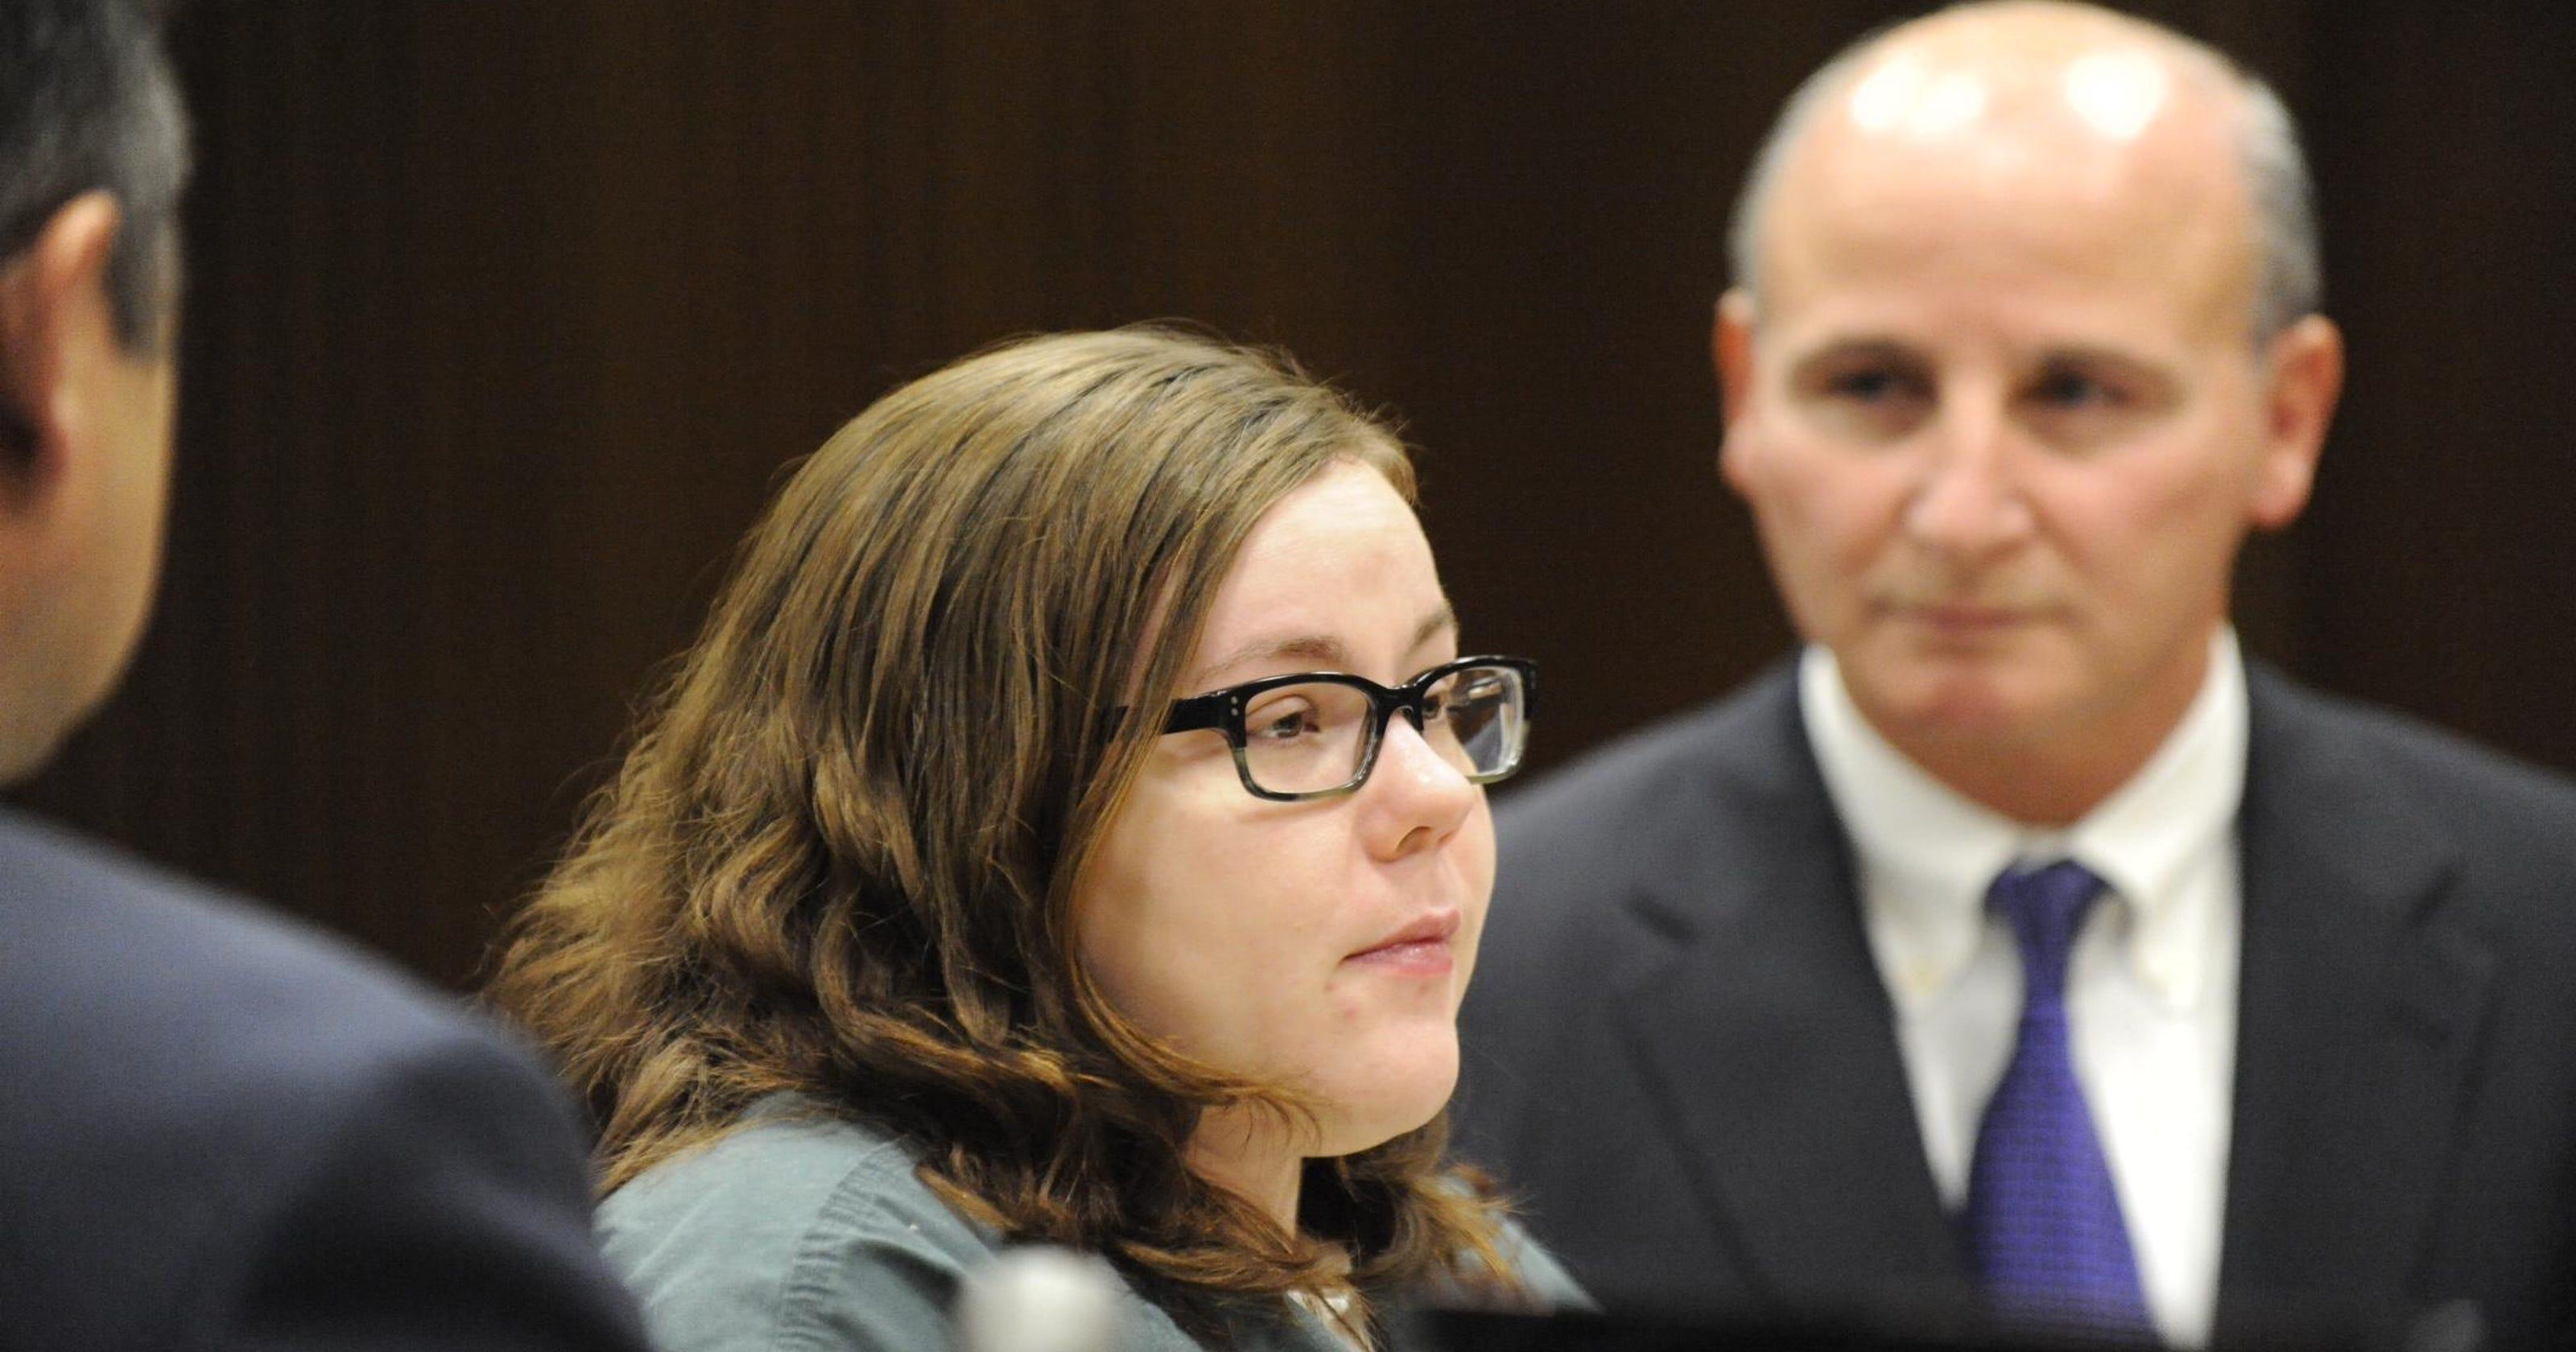 Wyandotte woman gets 9-20 years in death of newborn son